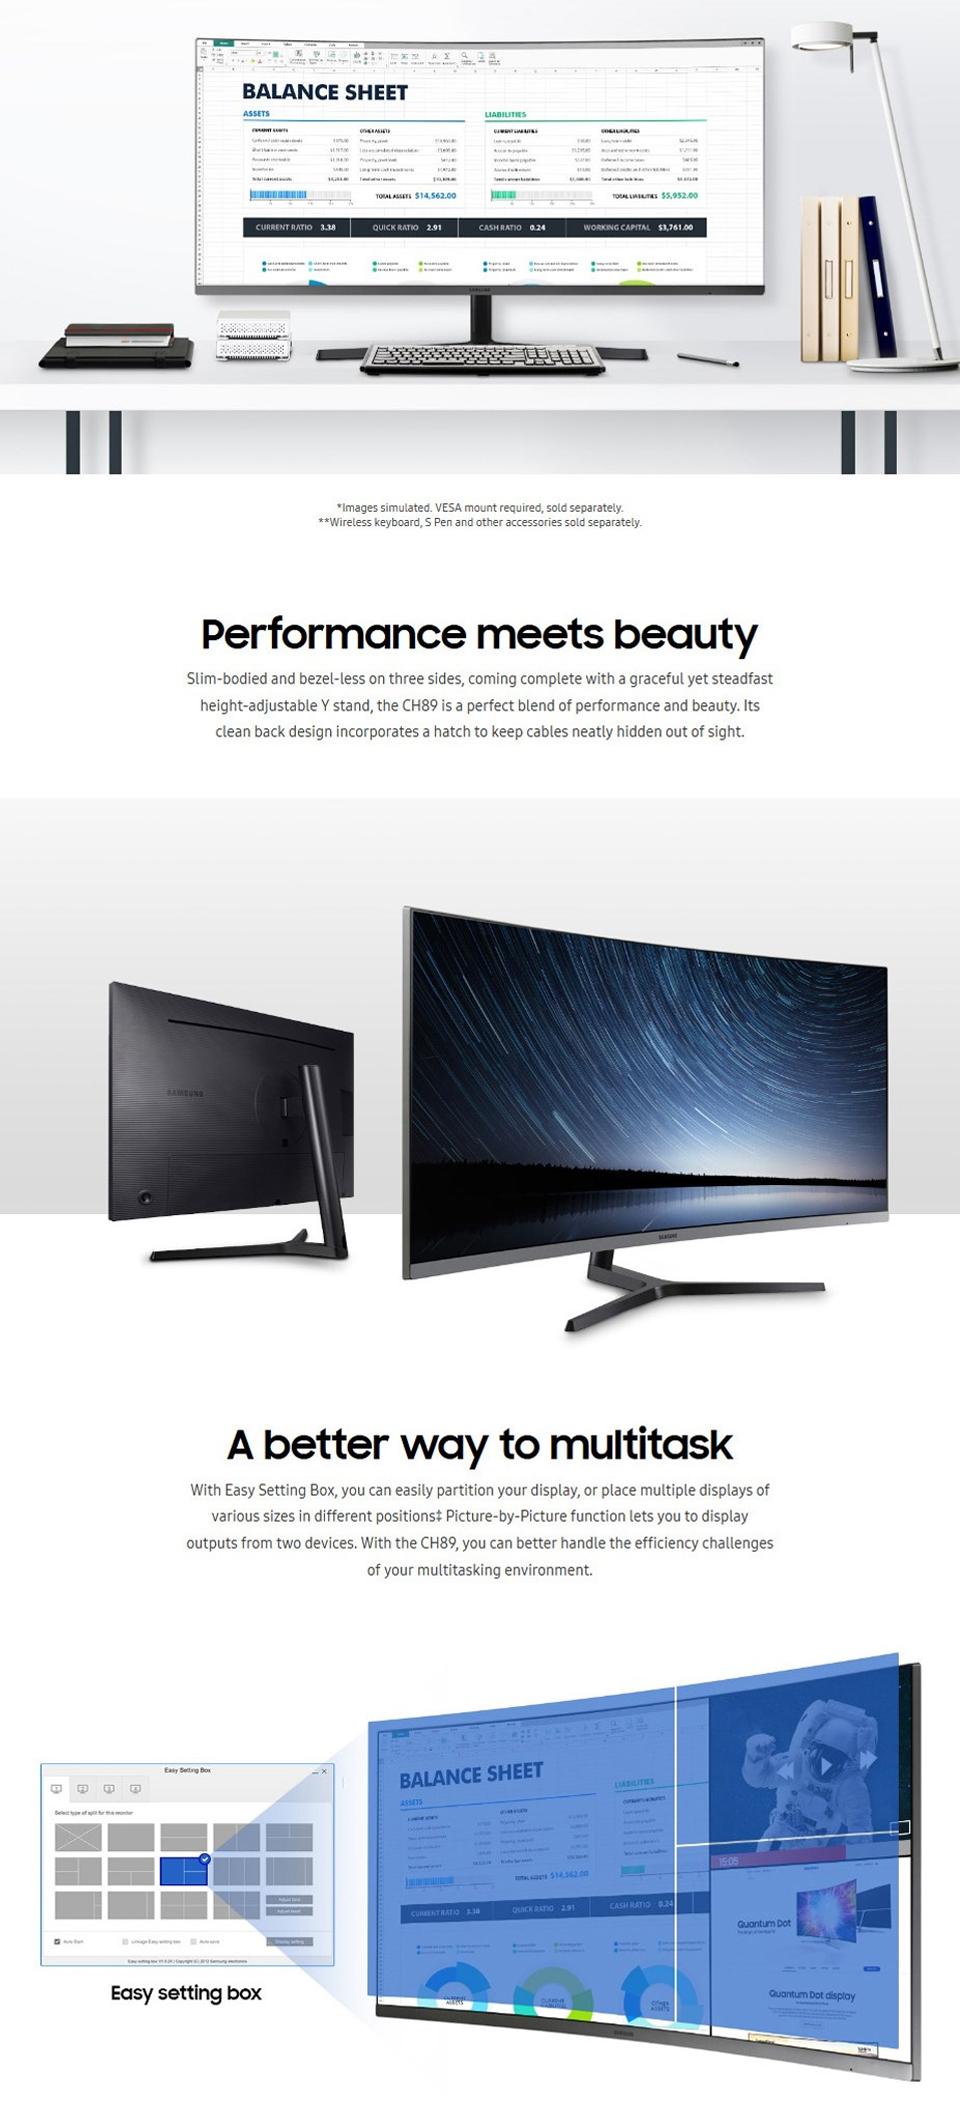 Samsung CH89 UWQHD 100Hz FreeSync Curved USB-C 34in Monitor features 2